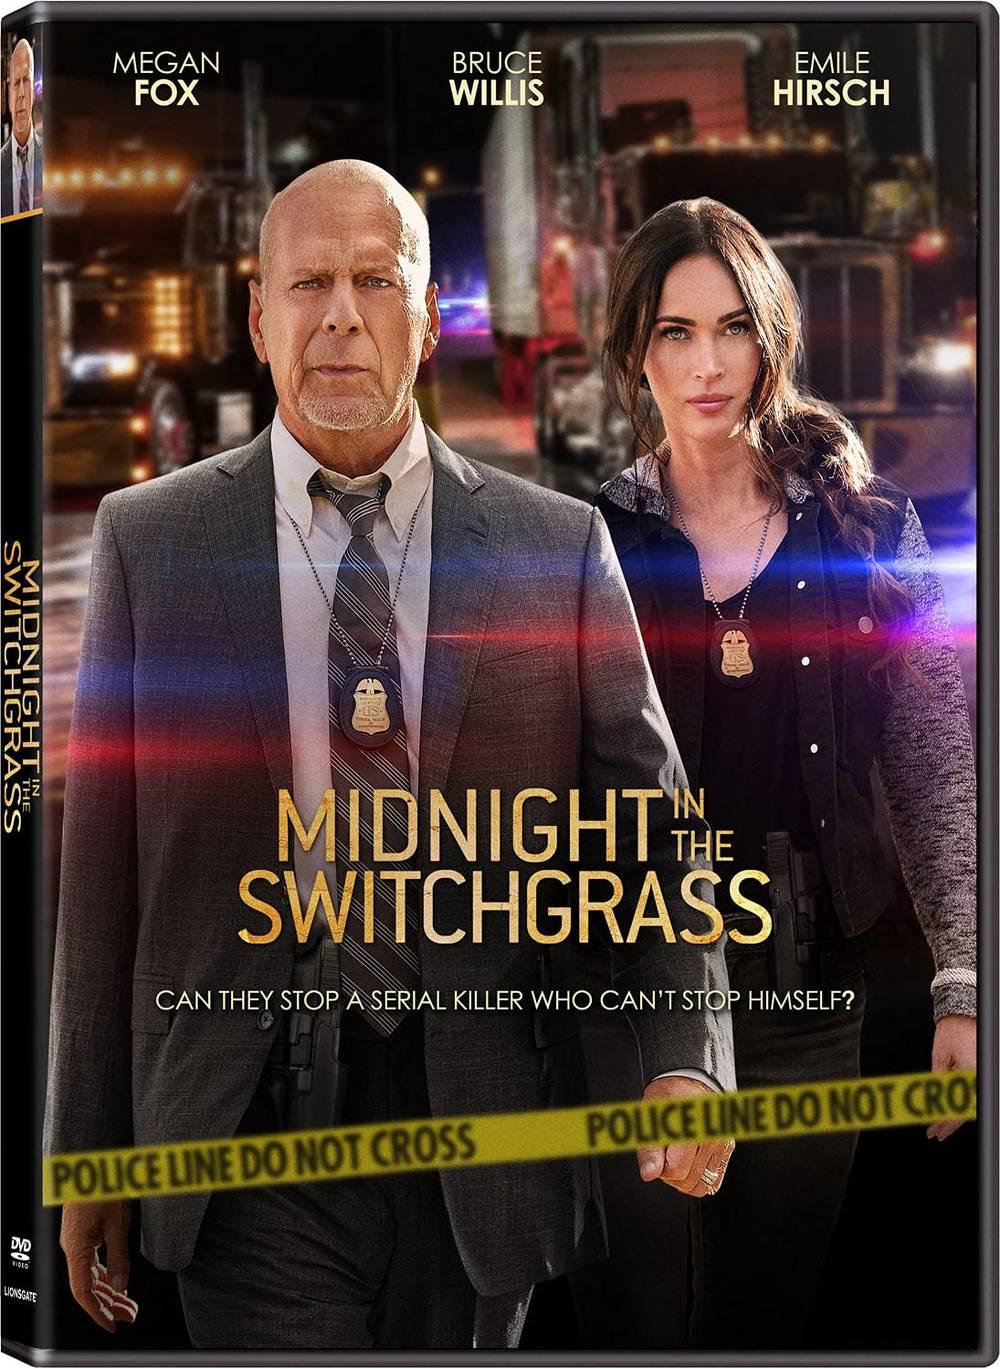 Midnight In The Switchgrass [Movie] - Midnight In The Switchgrass